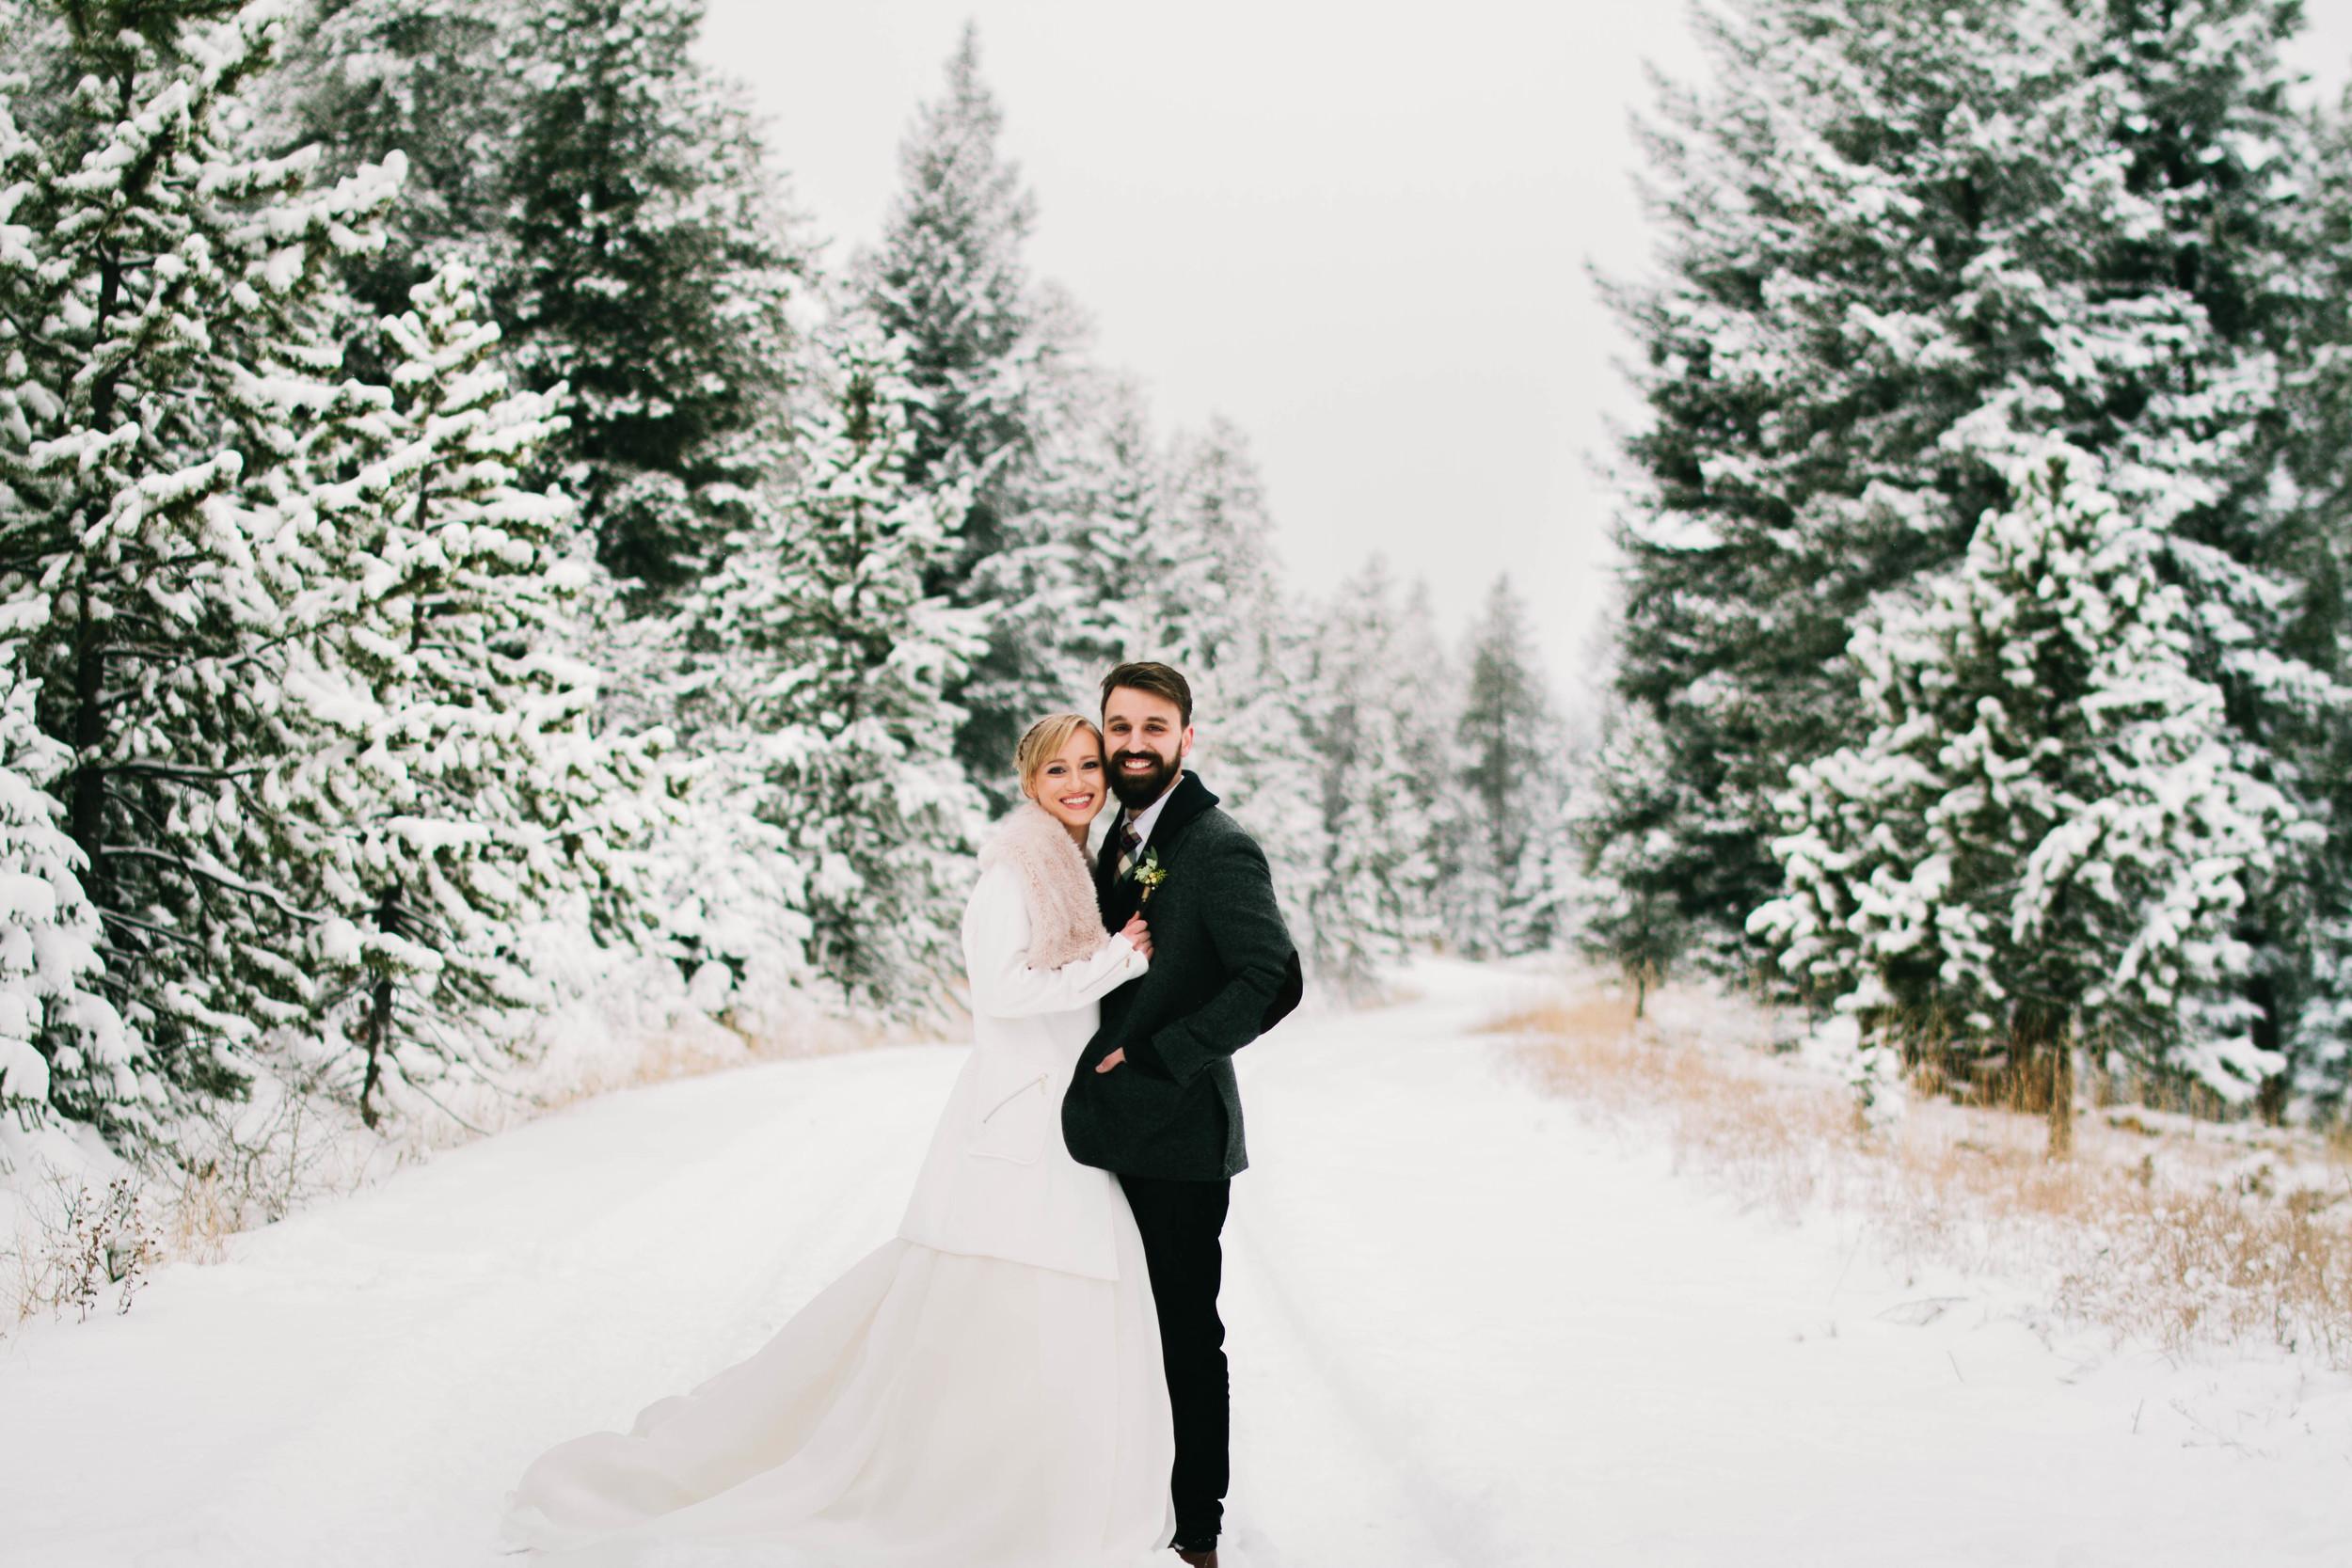 Bonin Wedding - Madeleine Bonin Photography-5747.jpg